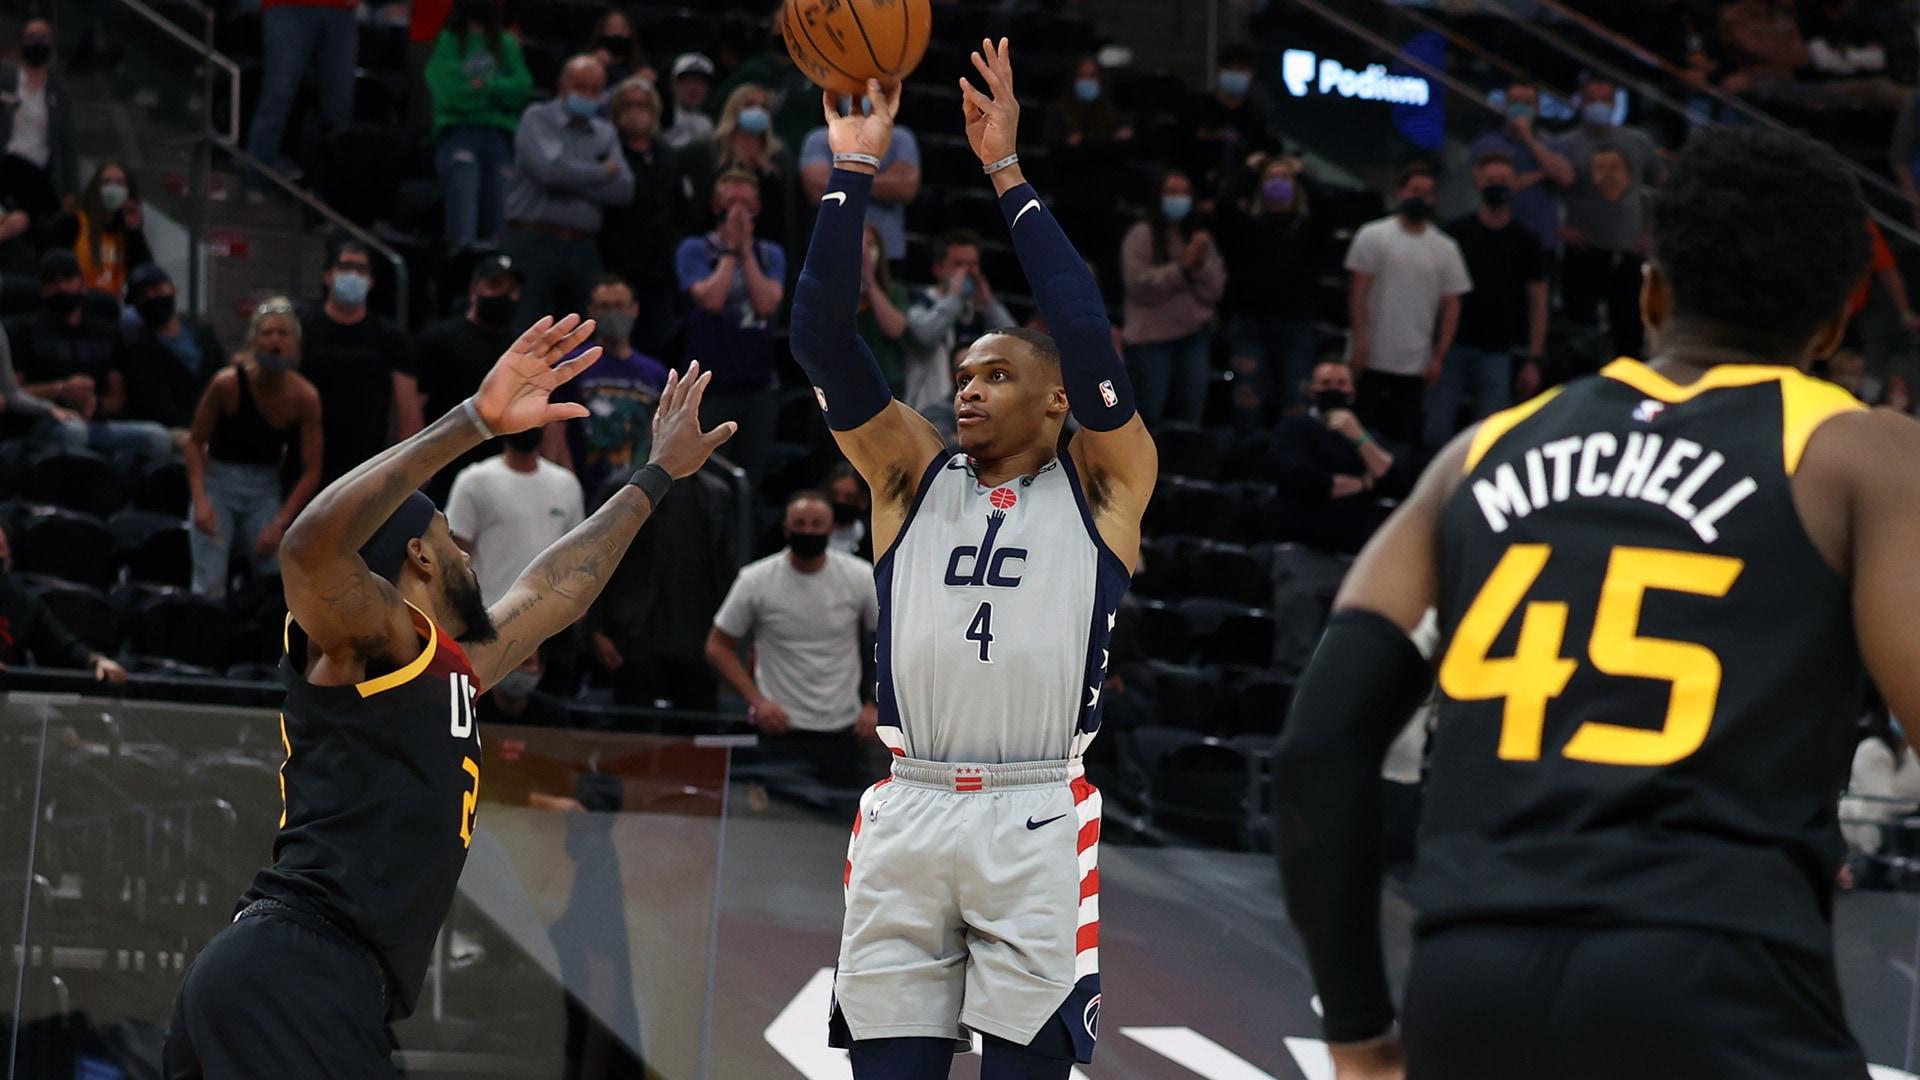 GameTime breaks down the Wizards win over the Jazz